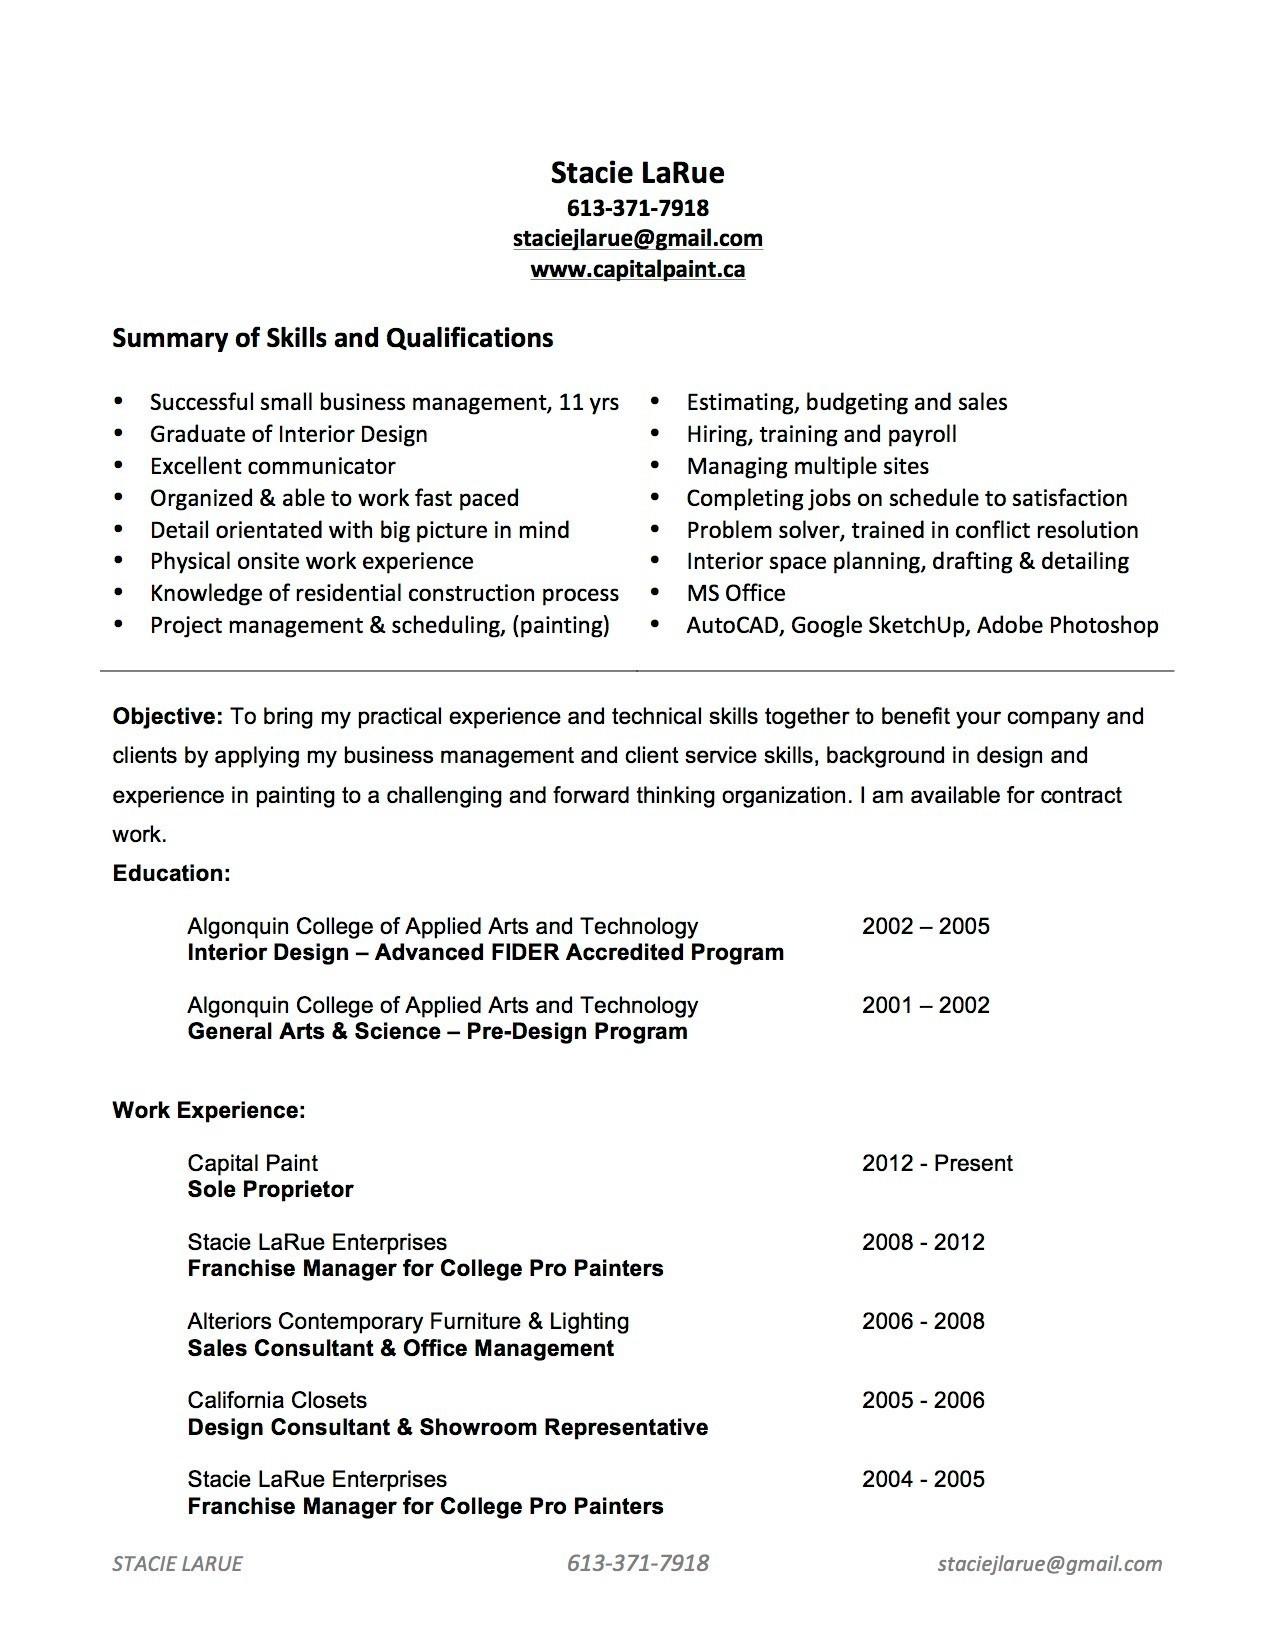 Charmant Algonquin College Lebenslauf Hilfe Ideen - Entry Level ...